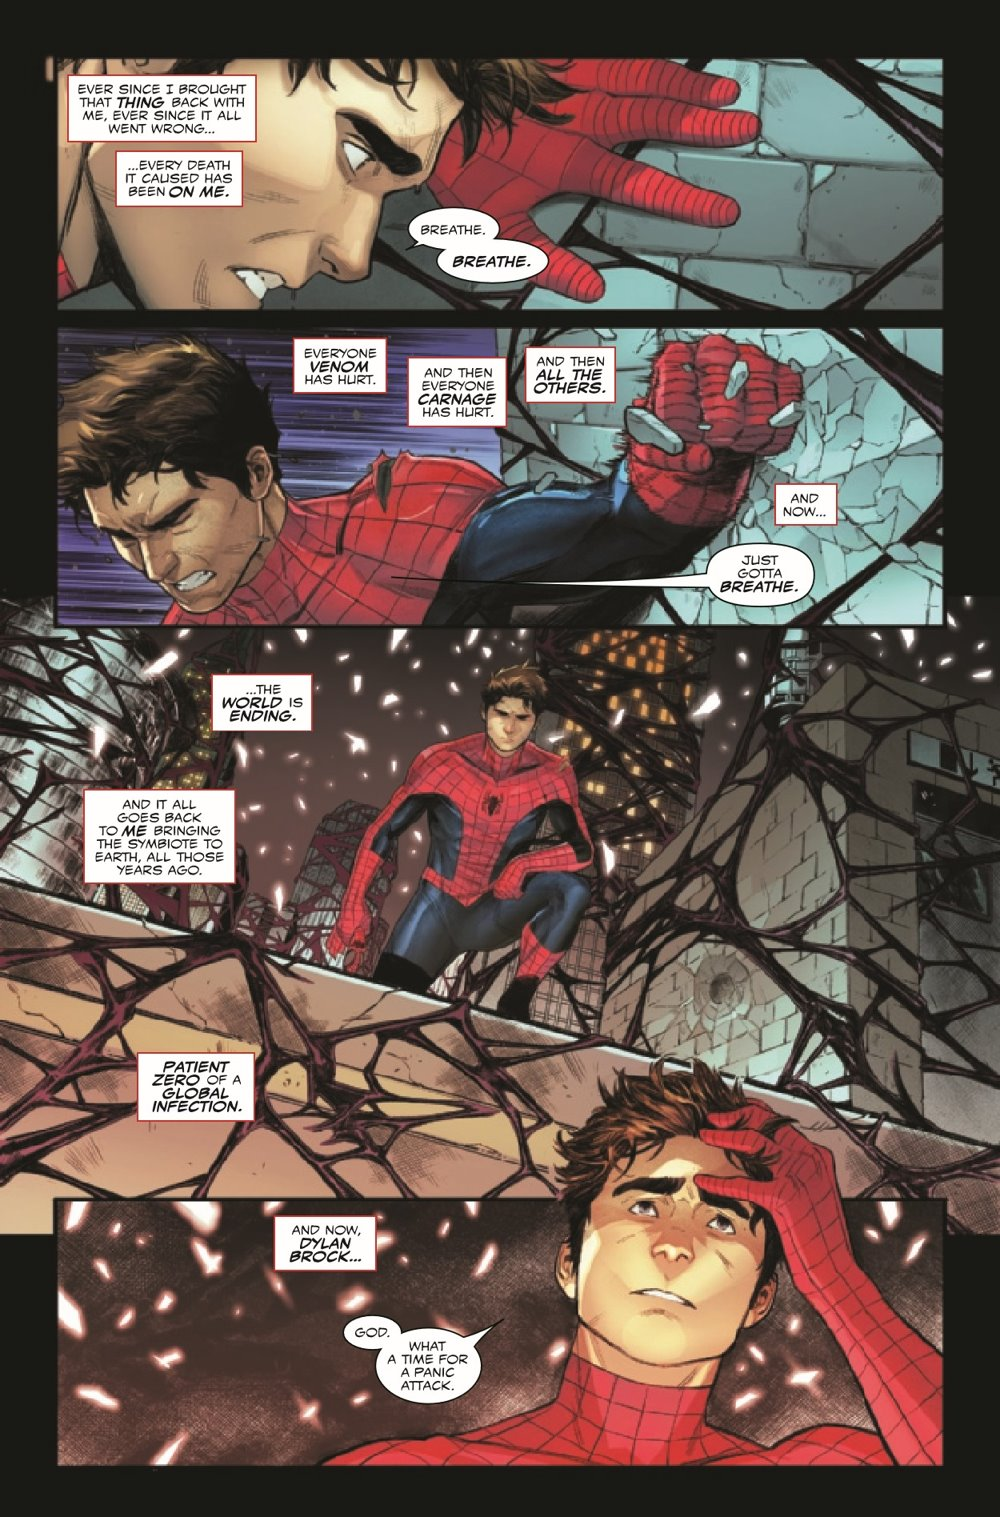 SMKIB2021001_Preview-4 ComicList Previews: KING IN BLACK SPIDER-MAN #1